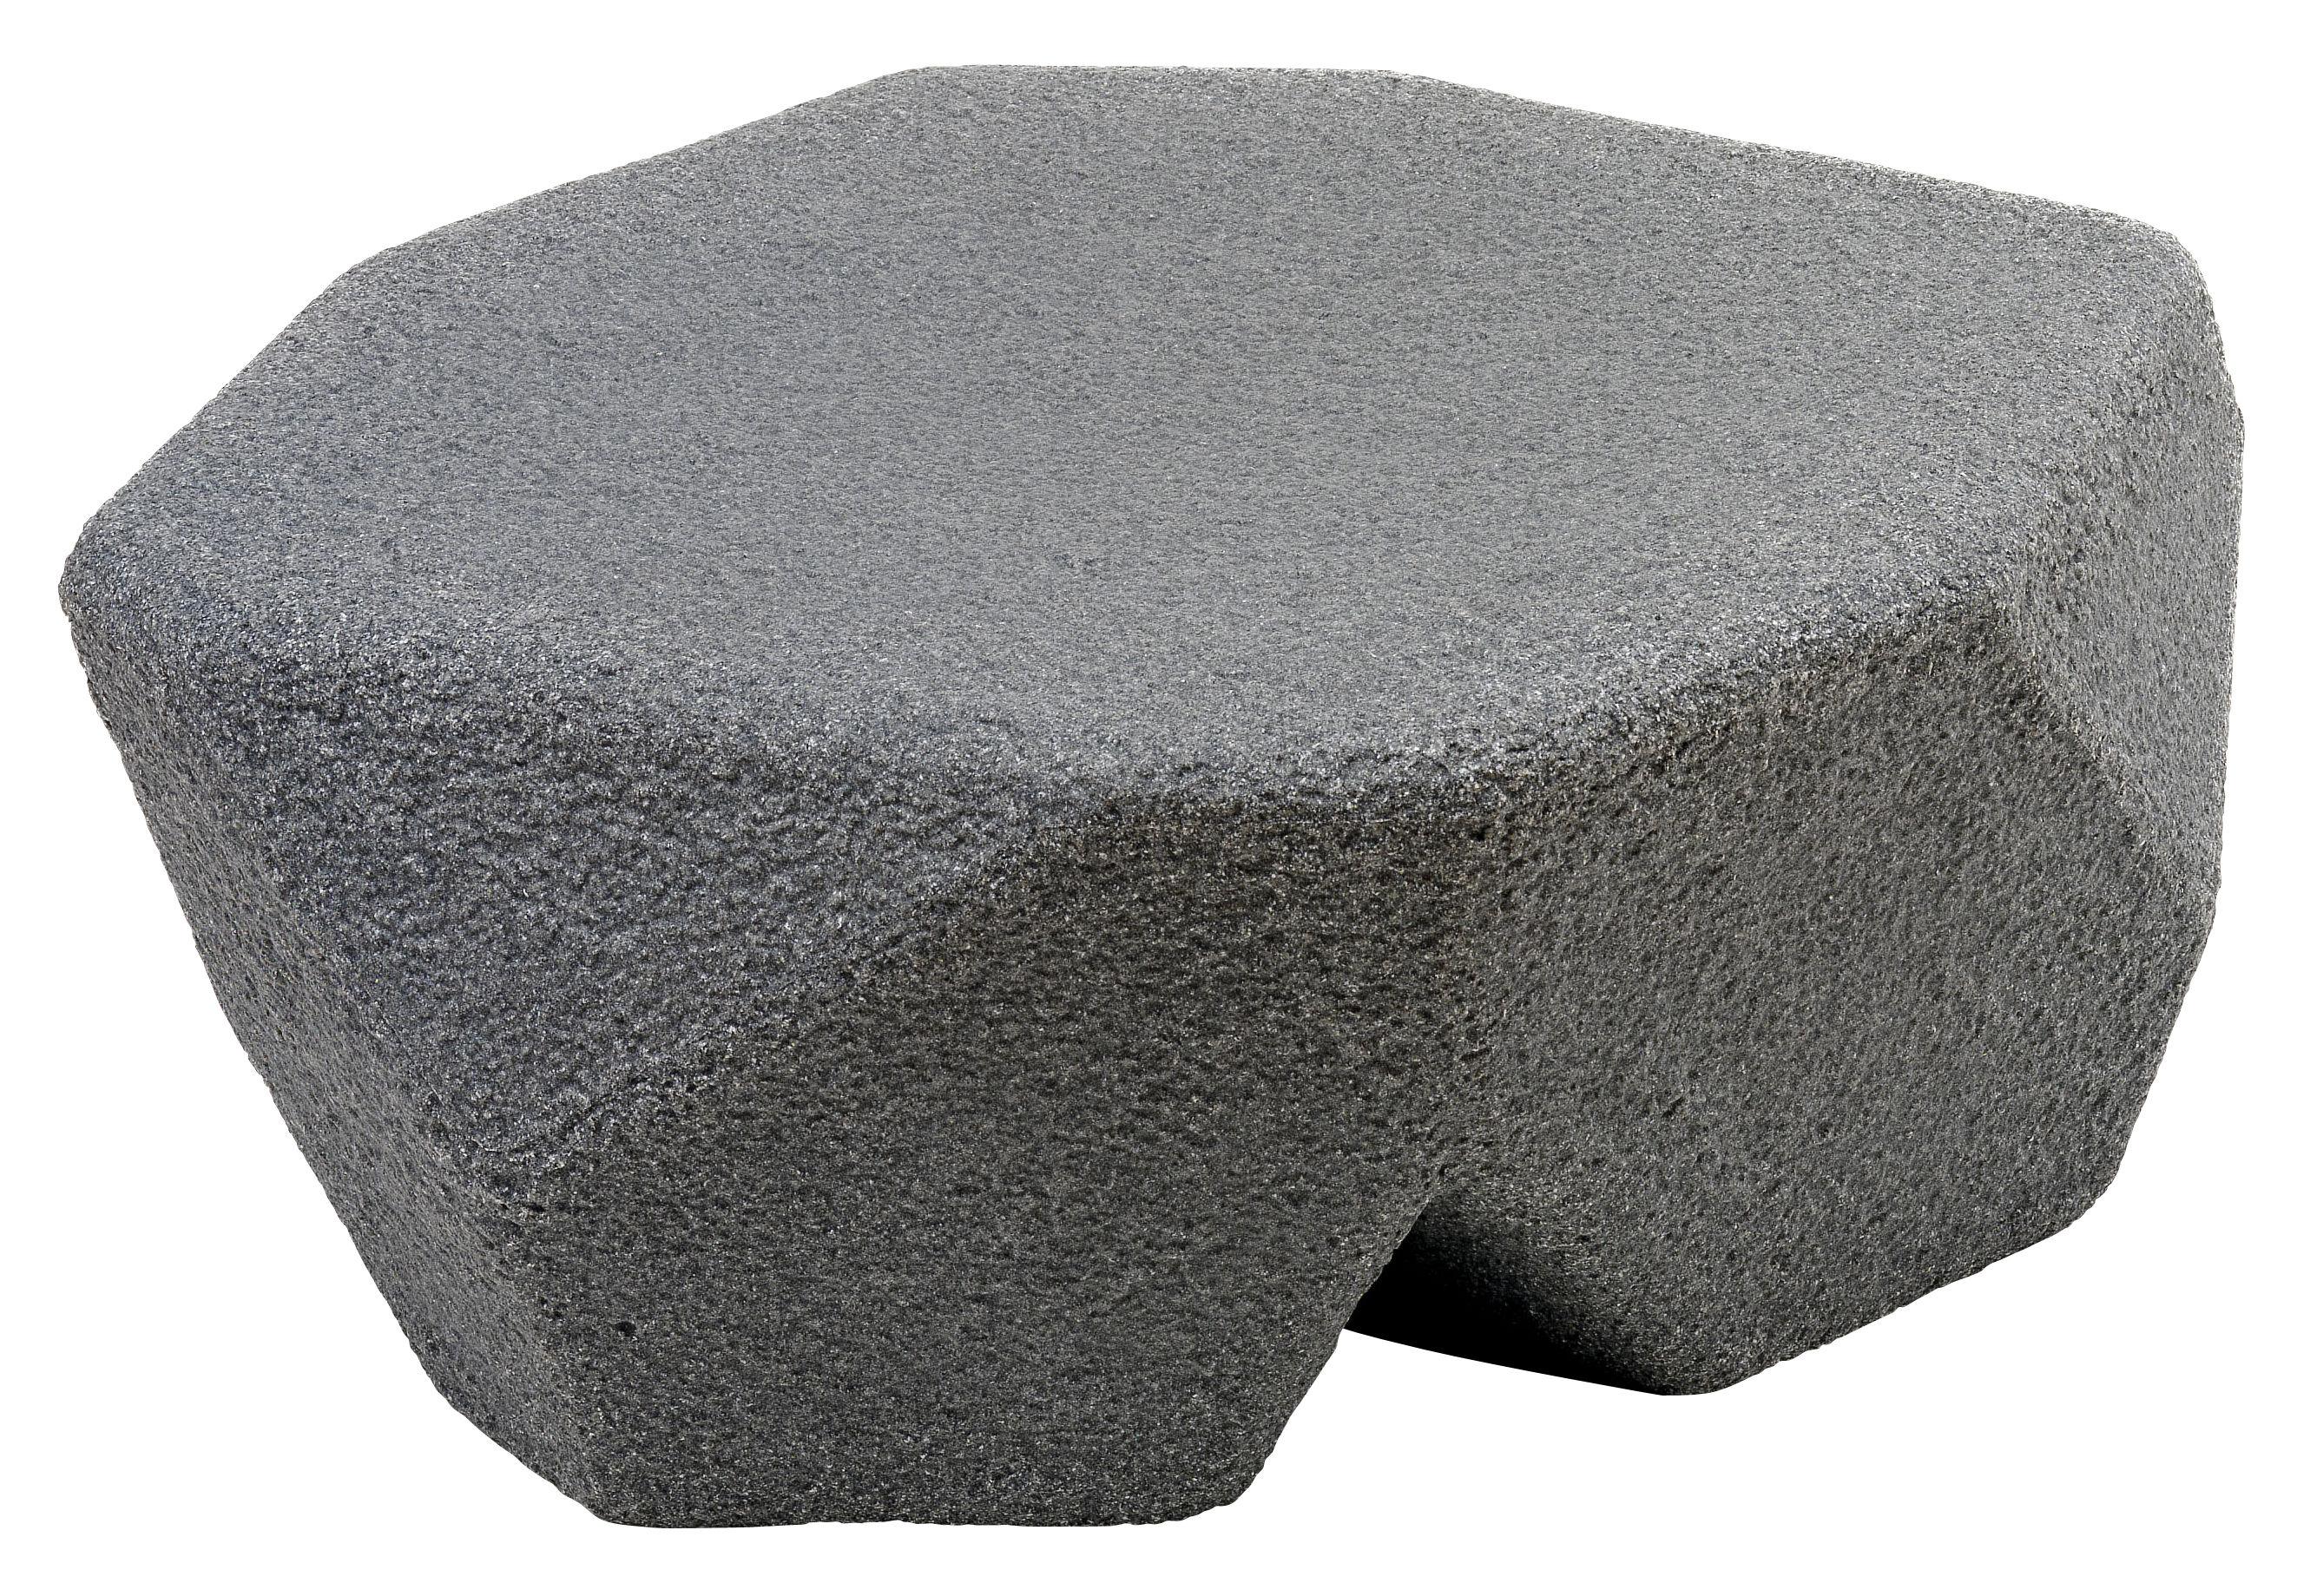 table enfant piedras pouf gris anthracite magis collection me too. Black Bedroom Furniture Sets. Home Design Ideas